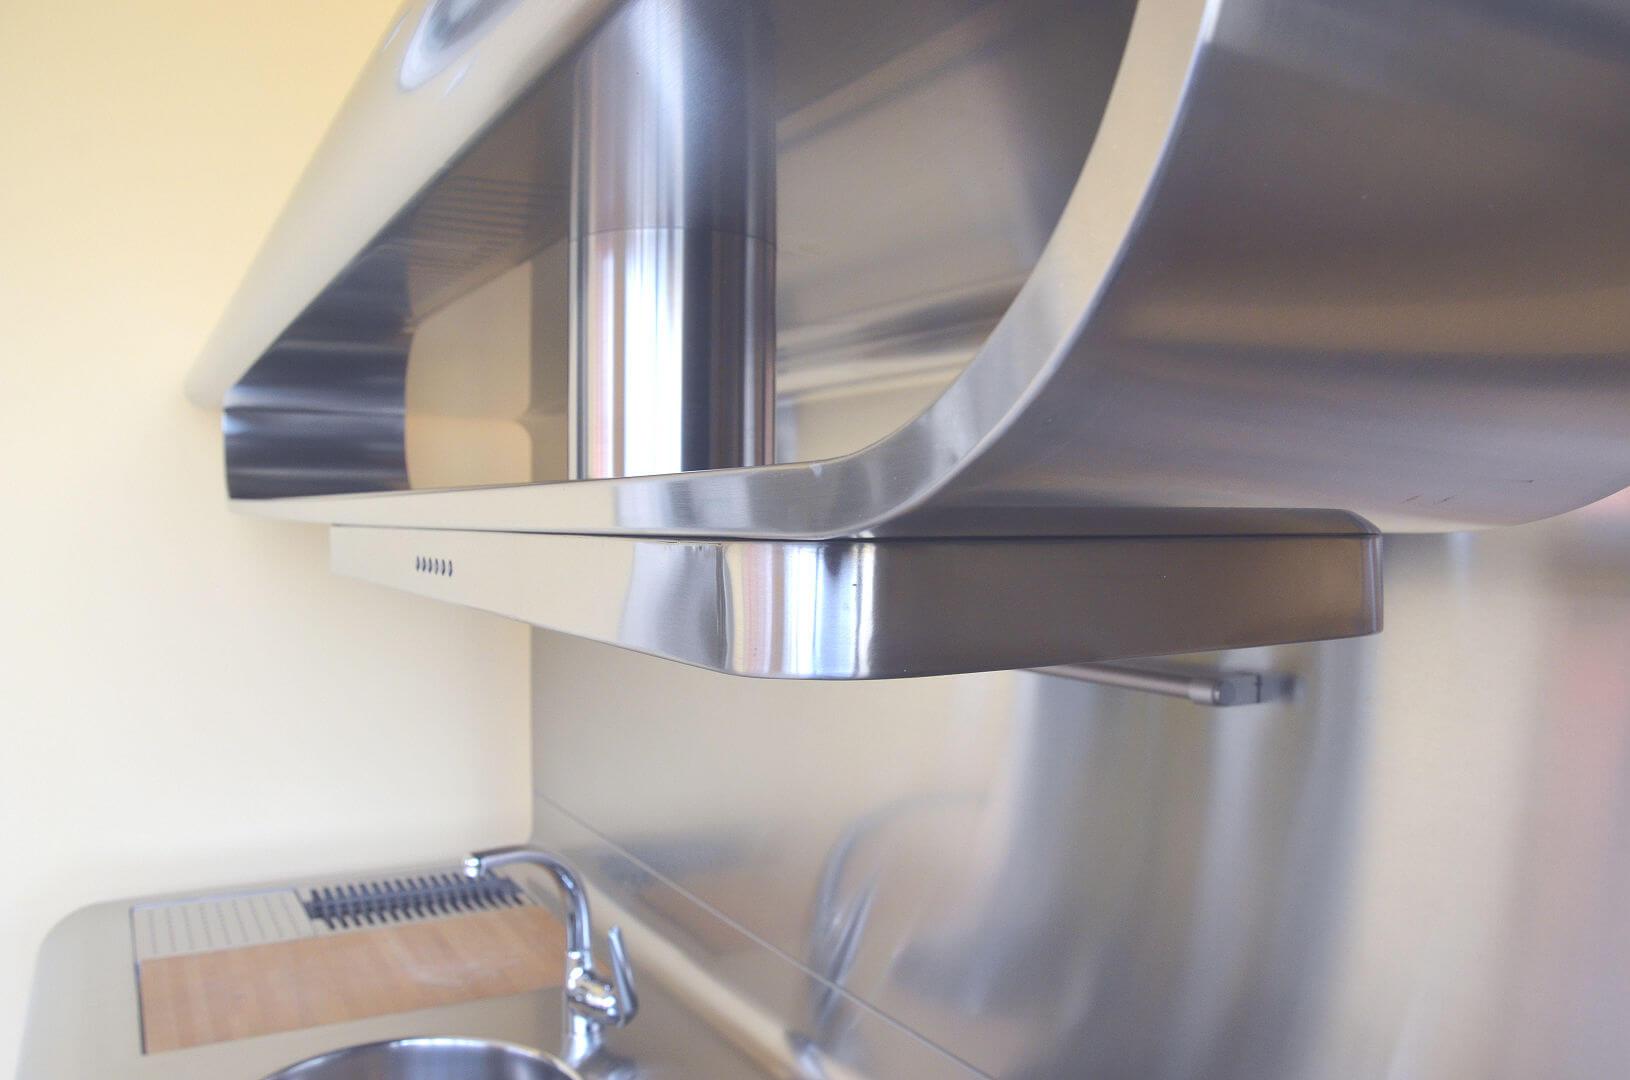 Arca Cucine Italy - Domestic stainless steel kitchens - Yacth - Apirazione